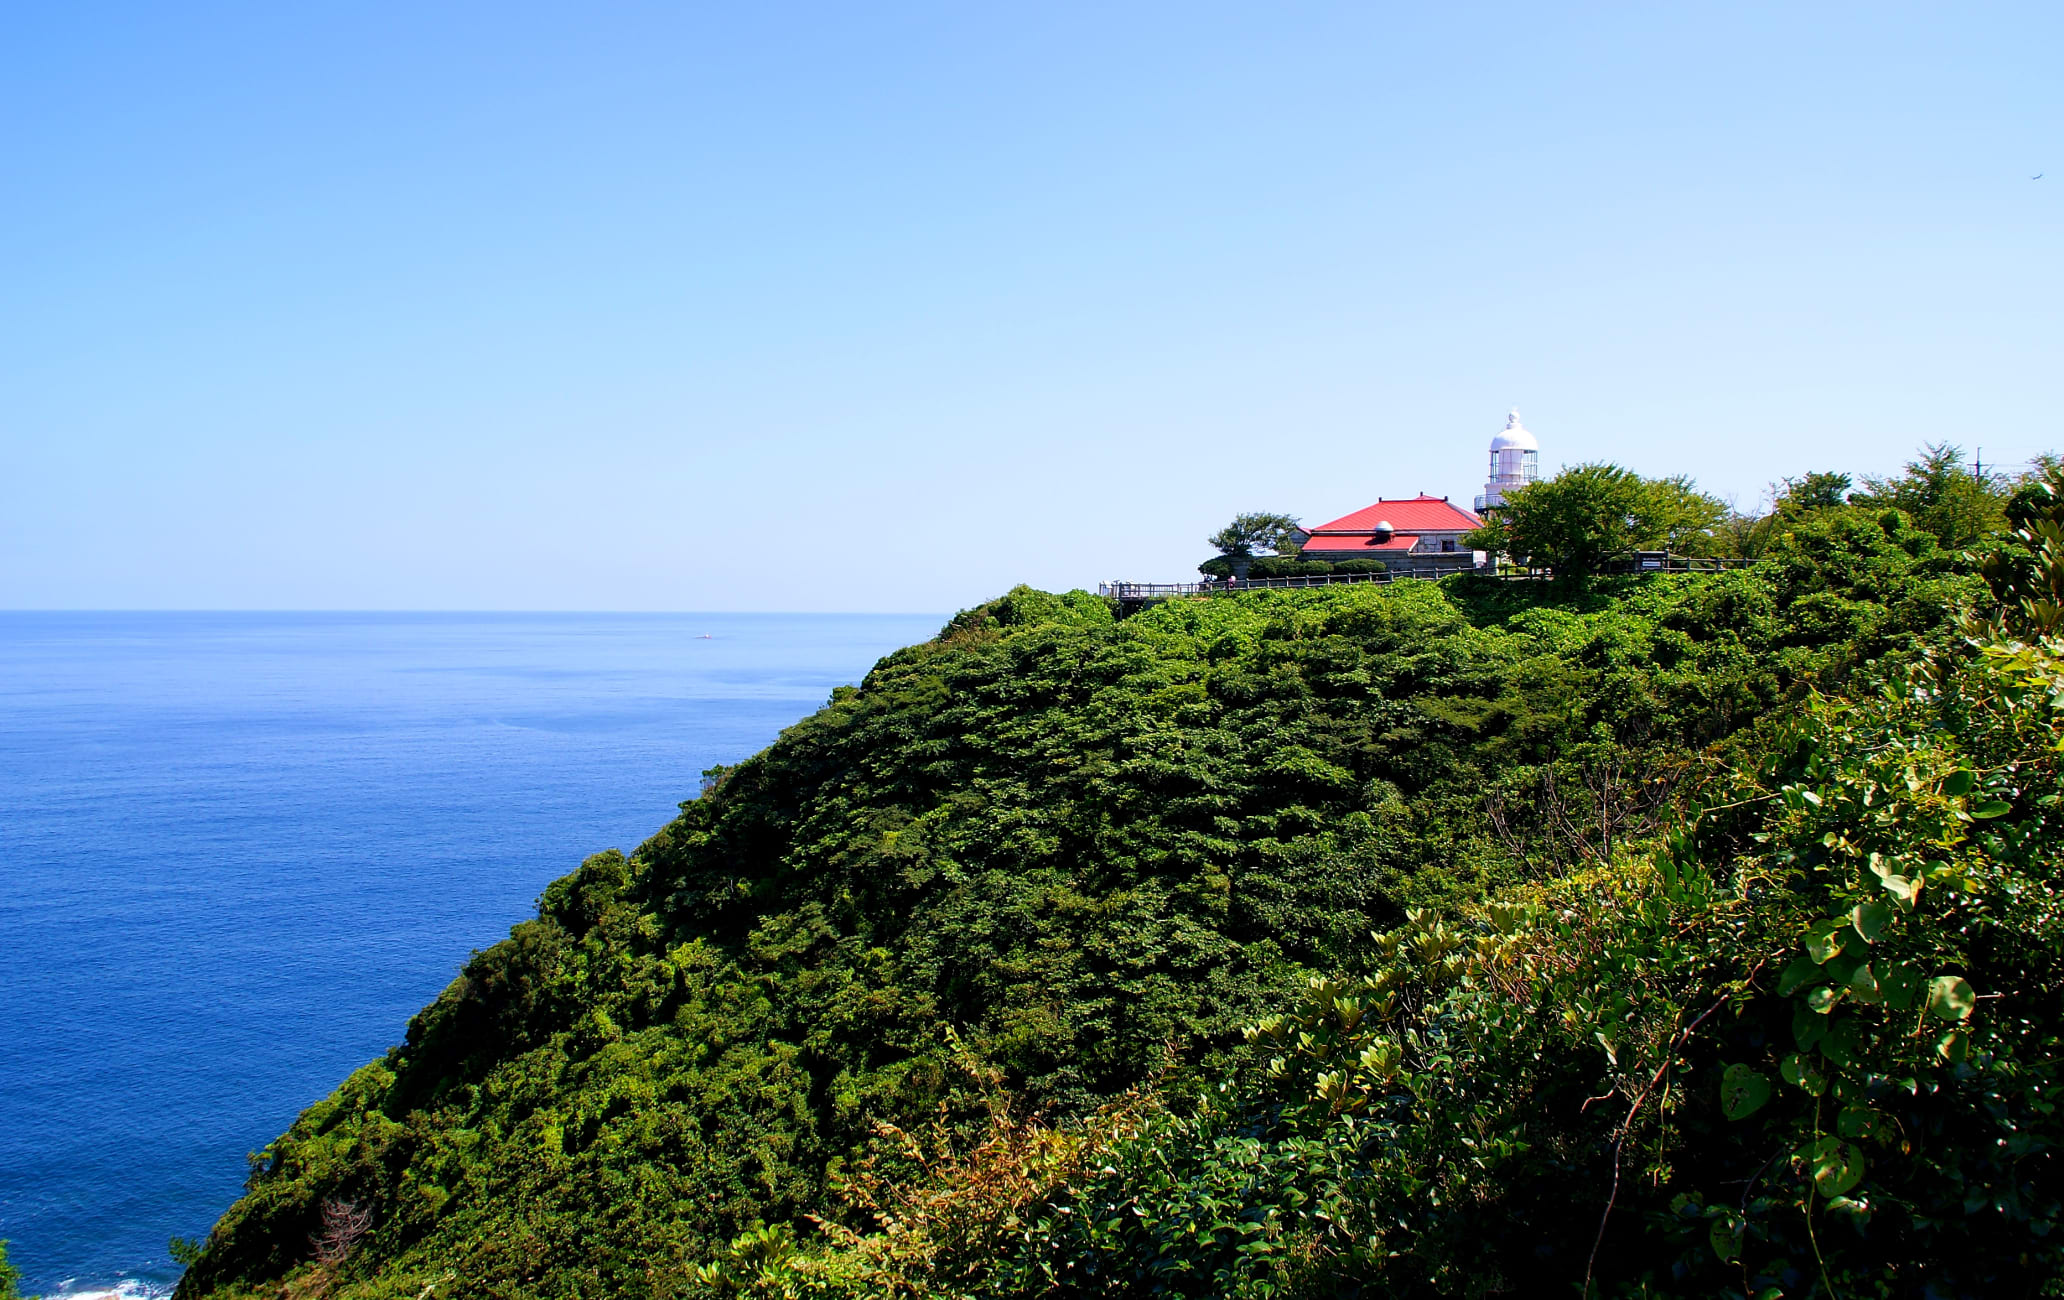 Mihonoseki Lighthouse